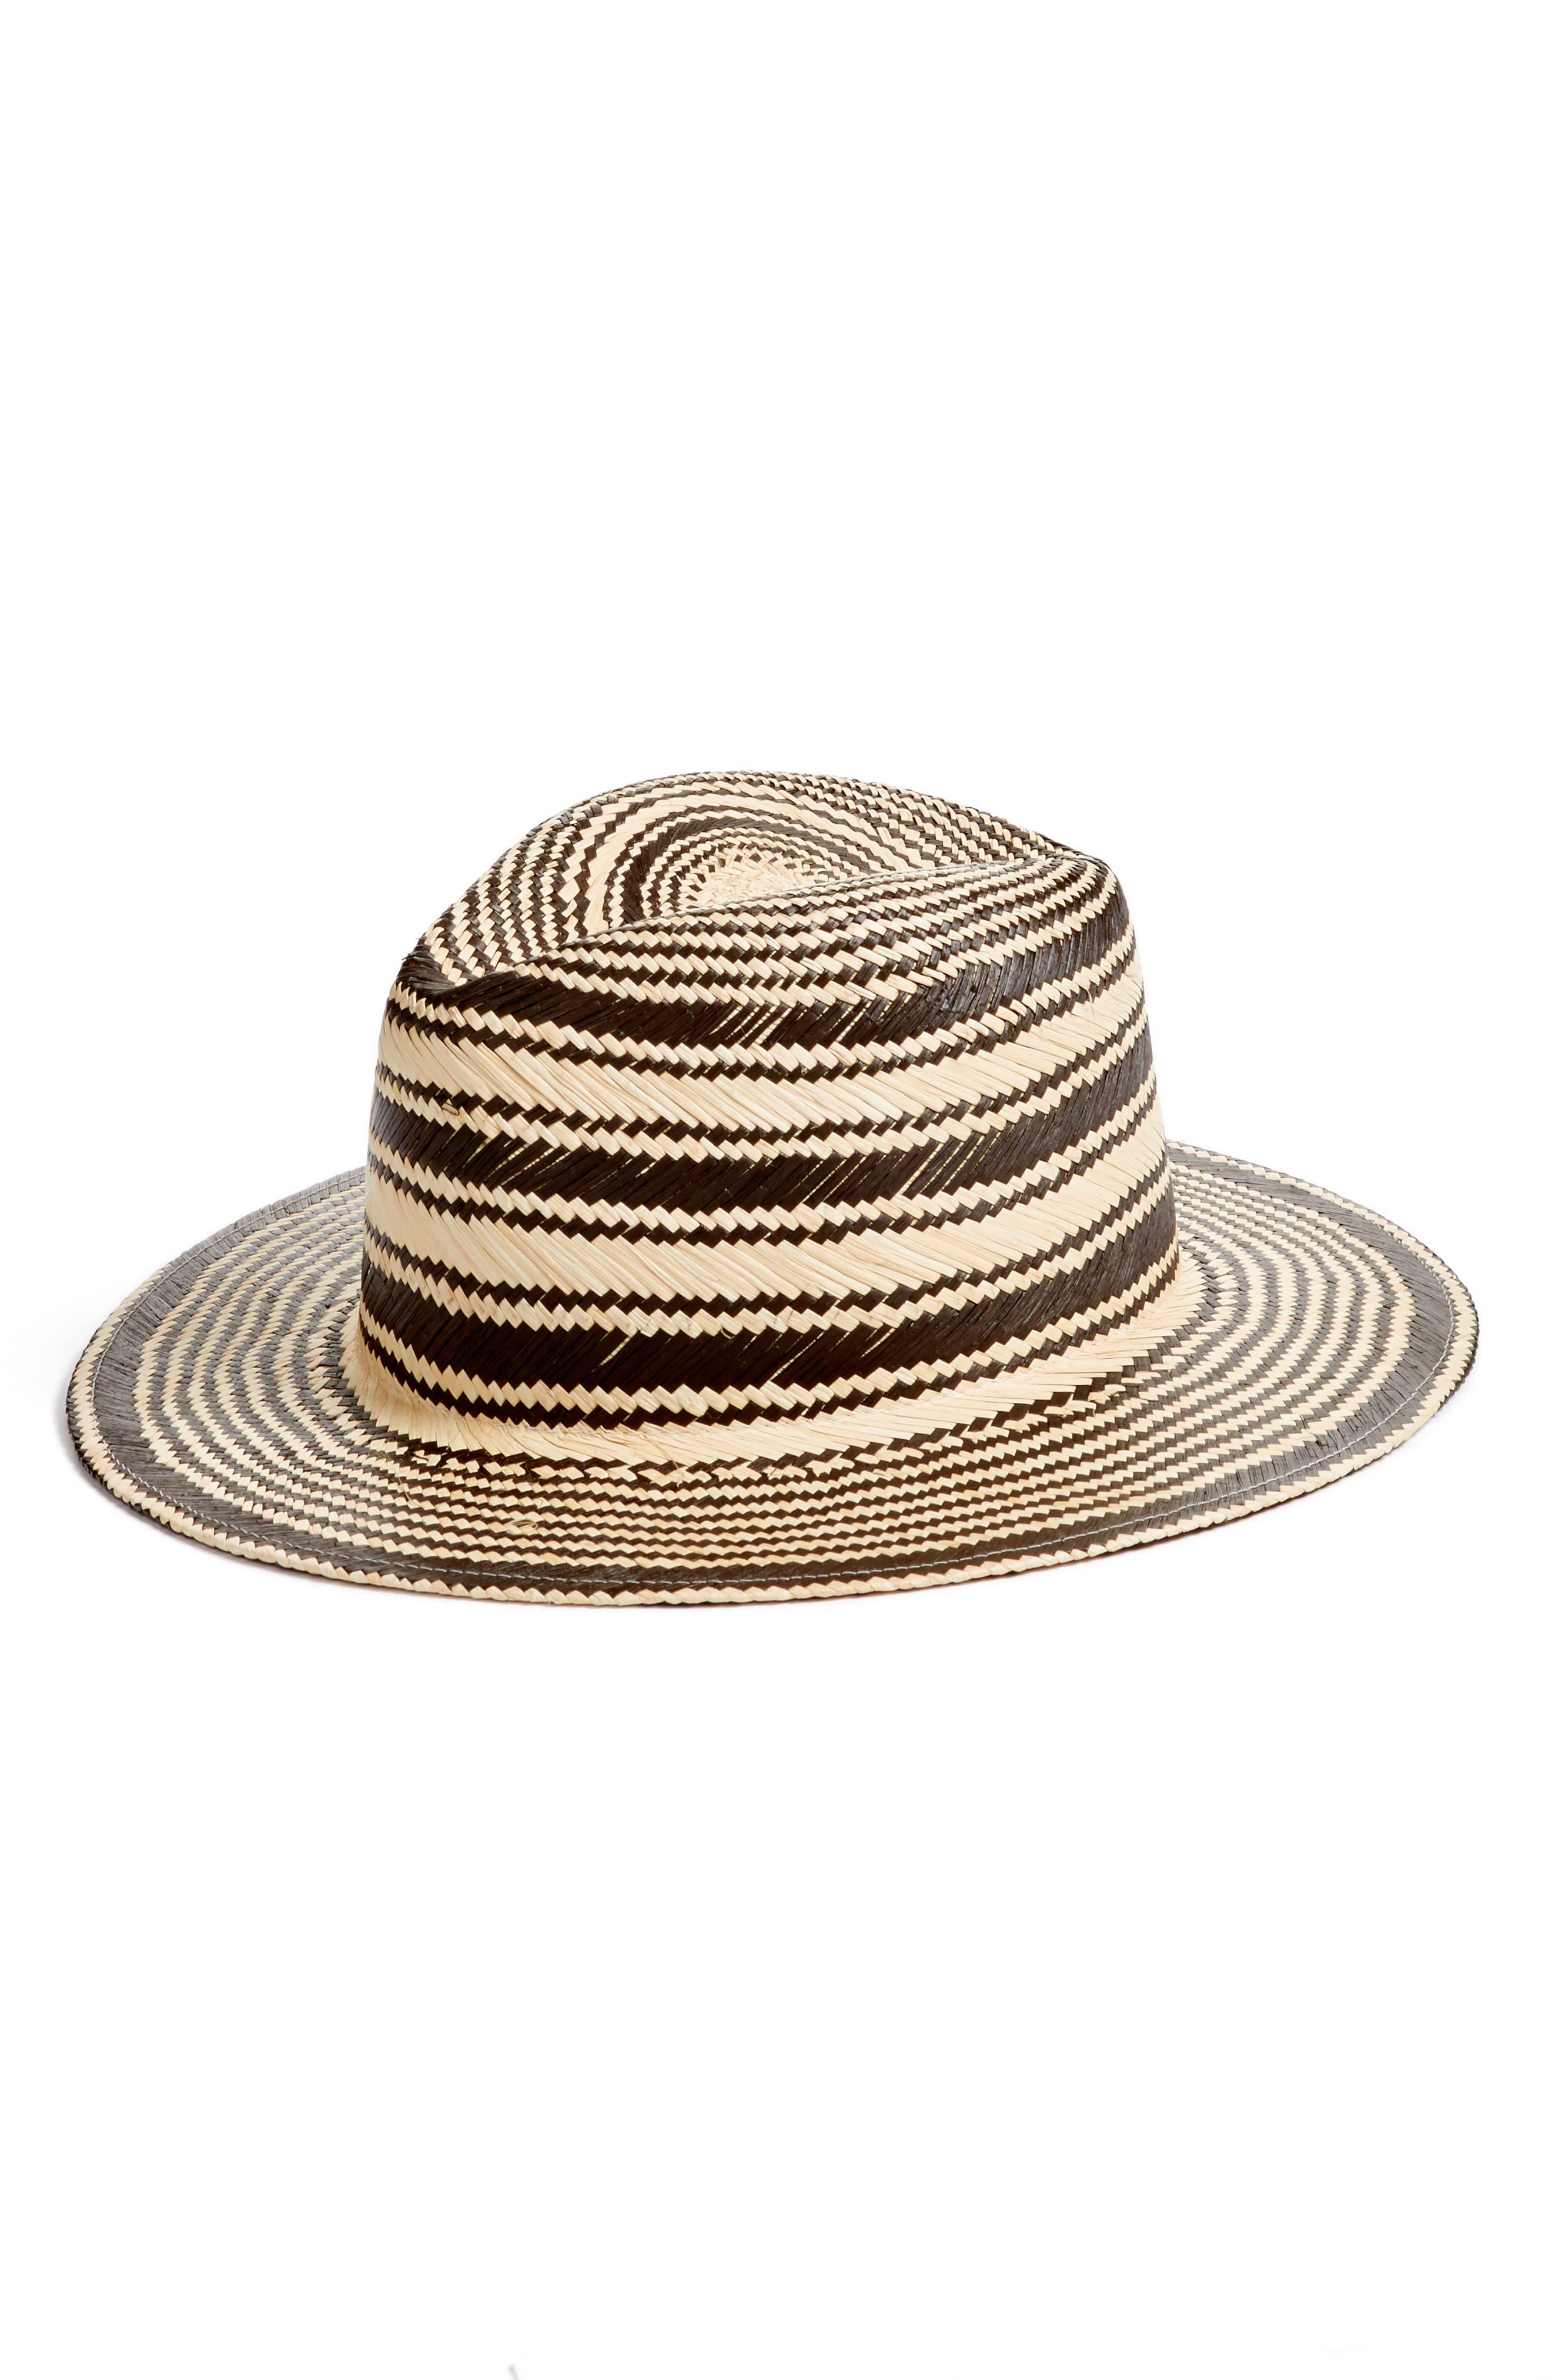 RAG & BONE Stripe Panama Hat, Main, color, 001